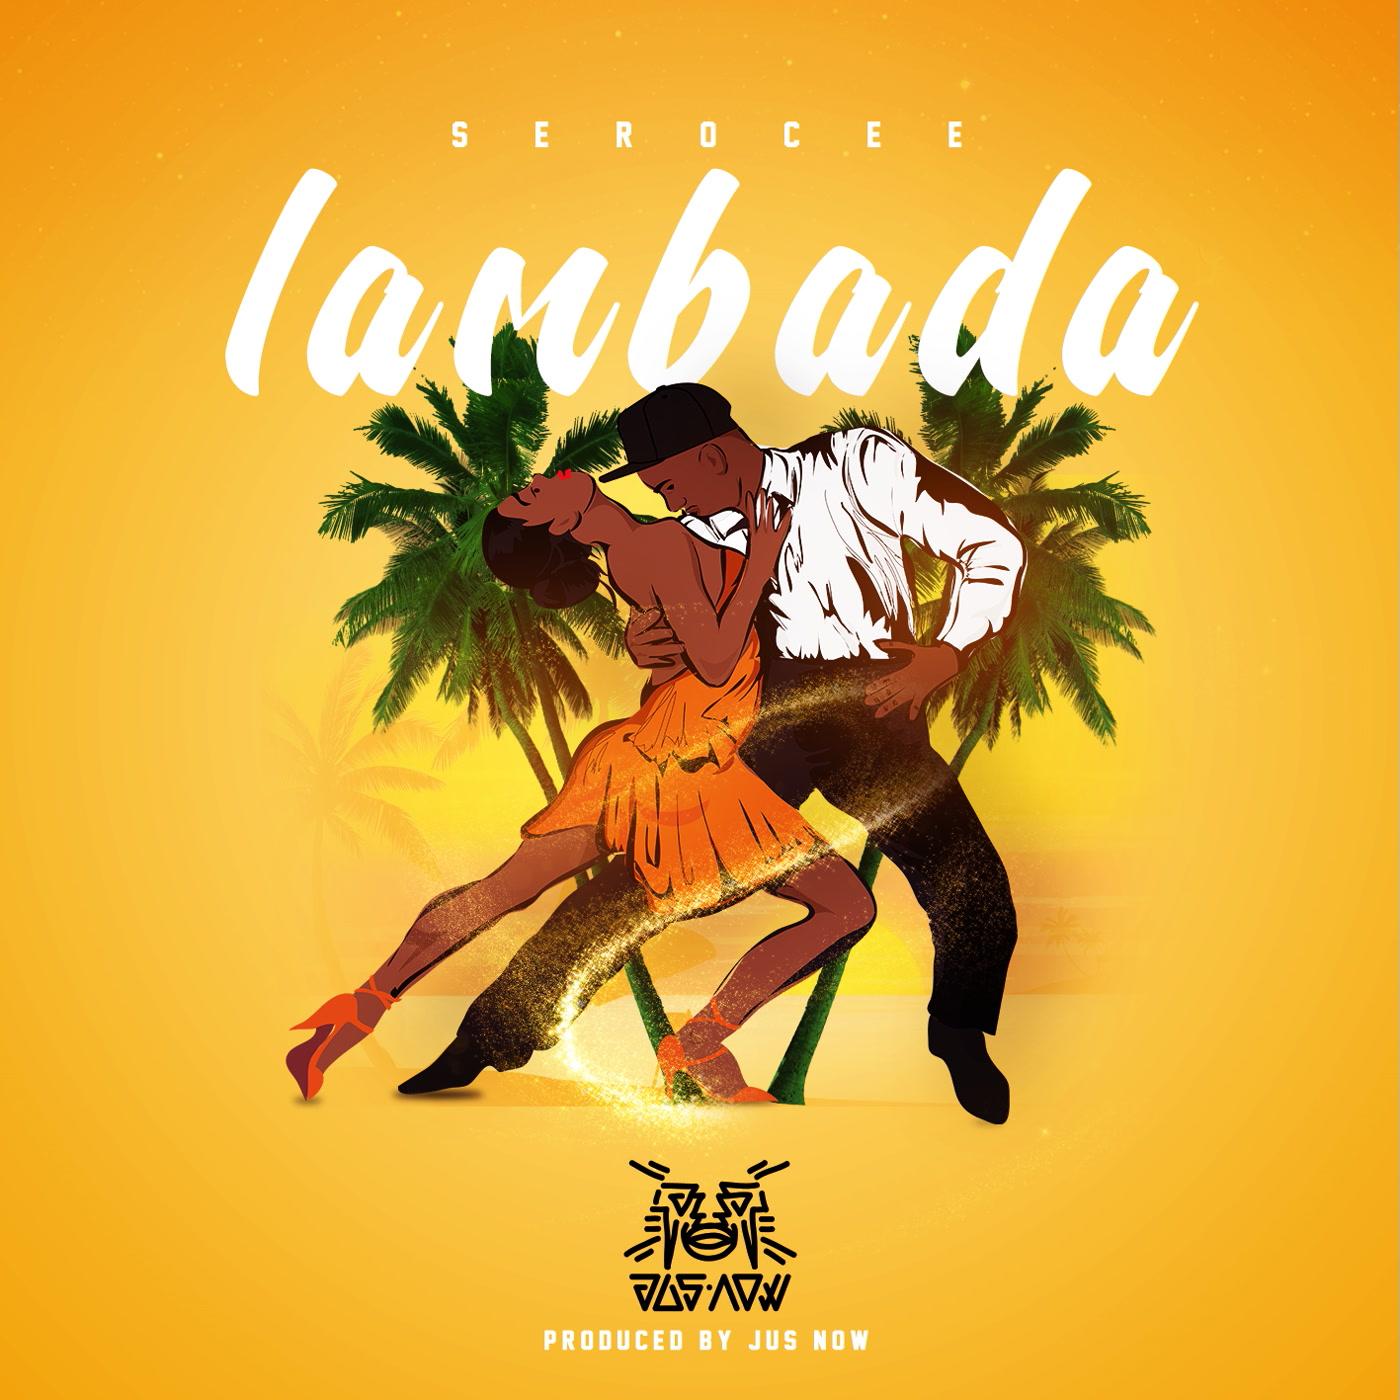 Forced To Do The Lambada Lambada The Forbidden